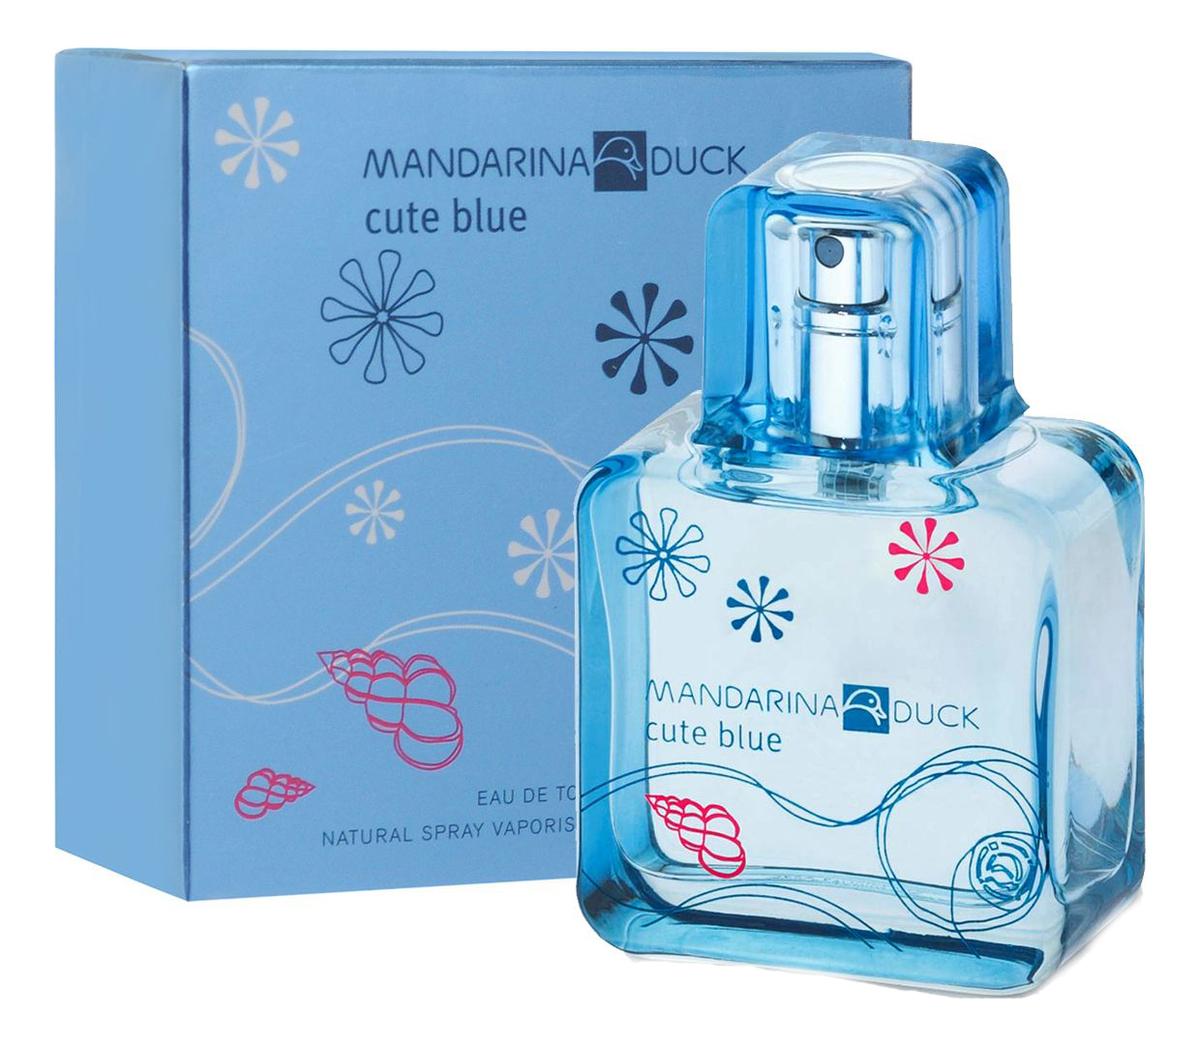 Купить Mandarina Duck Cute Blue Woman: туалетная вода 30мл